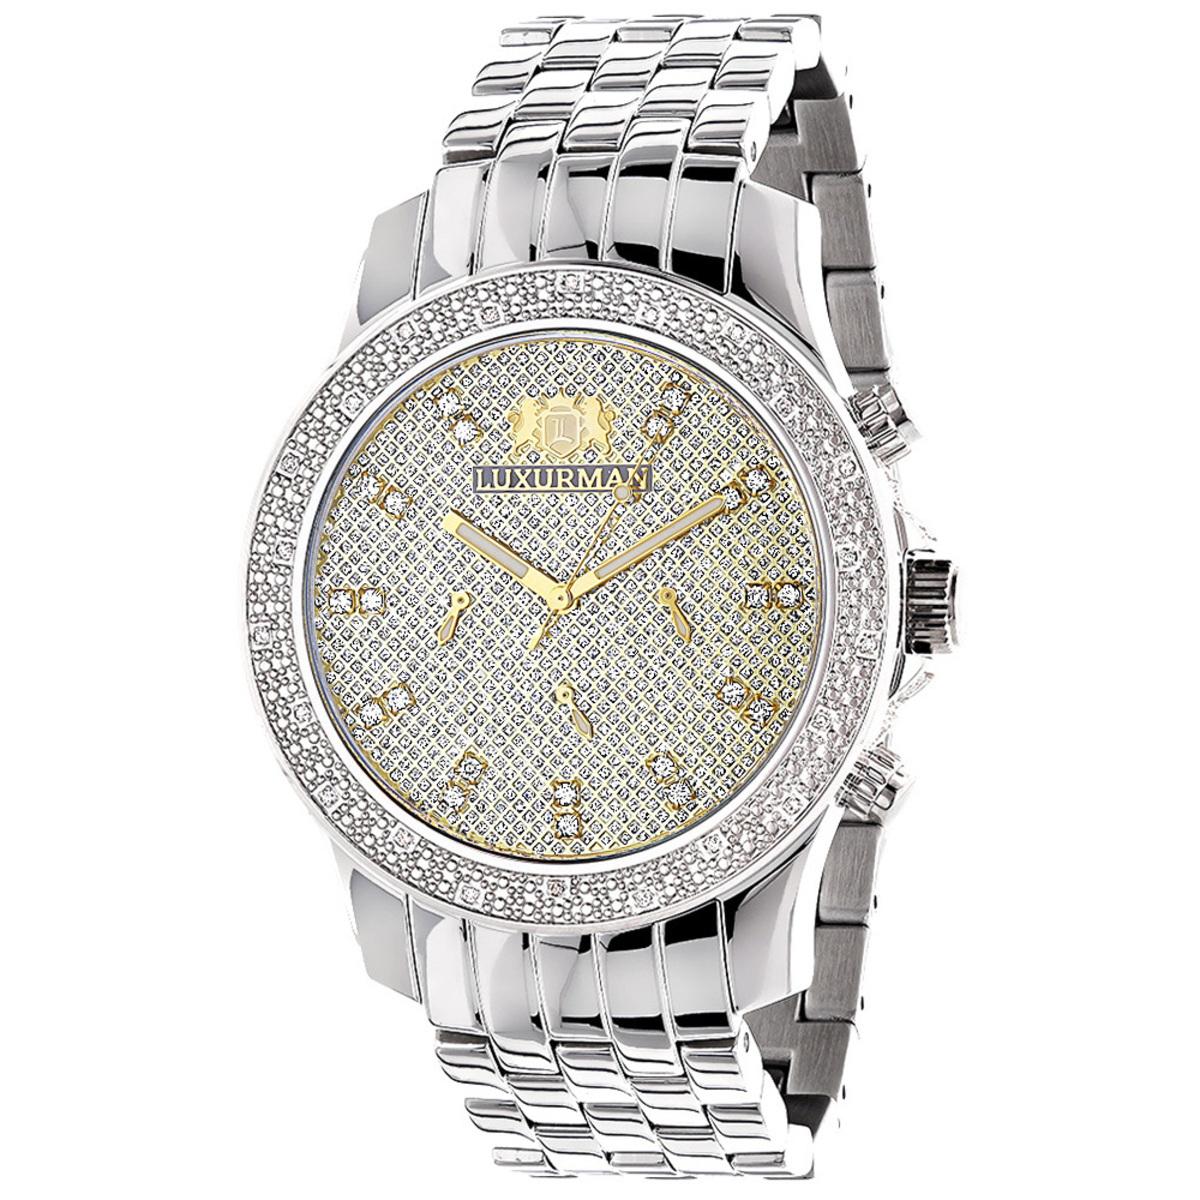 Luxurman Watches Mens Diamond Wristwatch 0.25ct